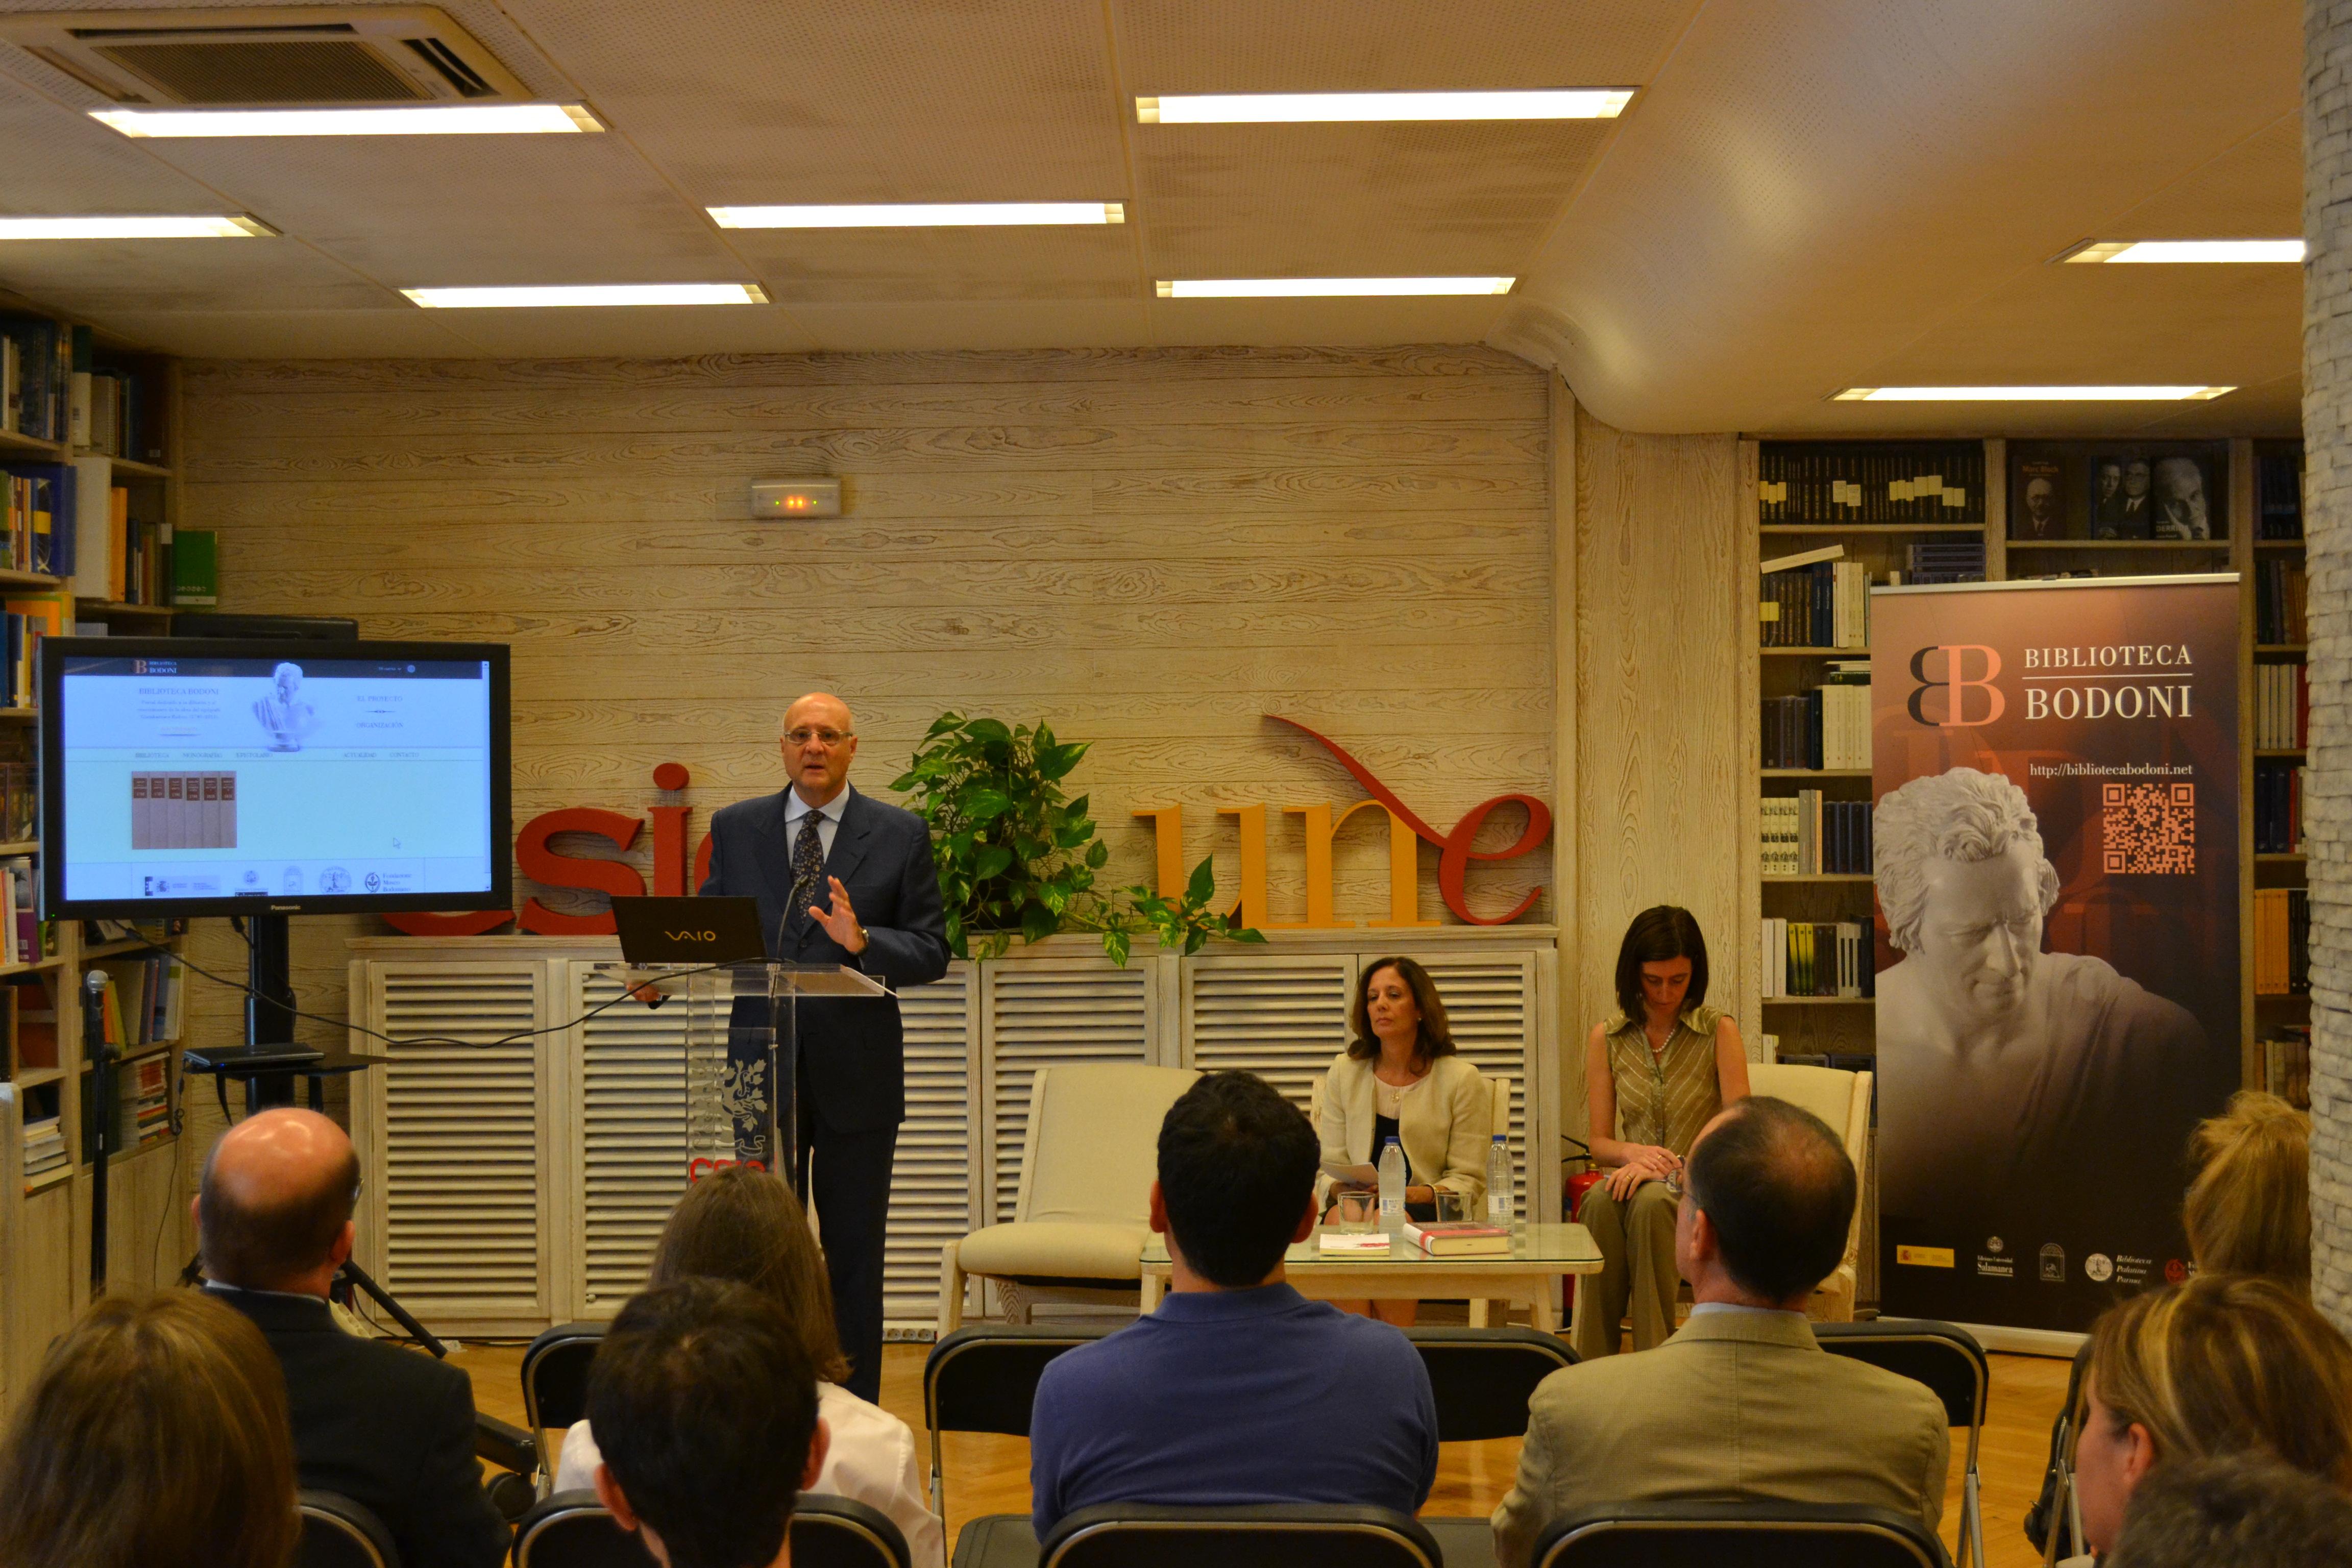 La Universidad de Salamanca presenta la primera biblioteca digital bodoniana